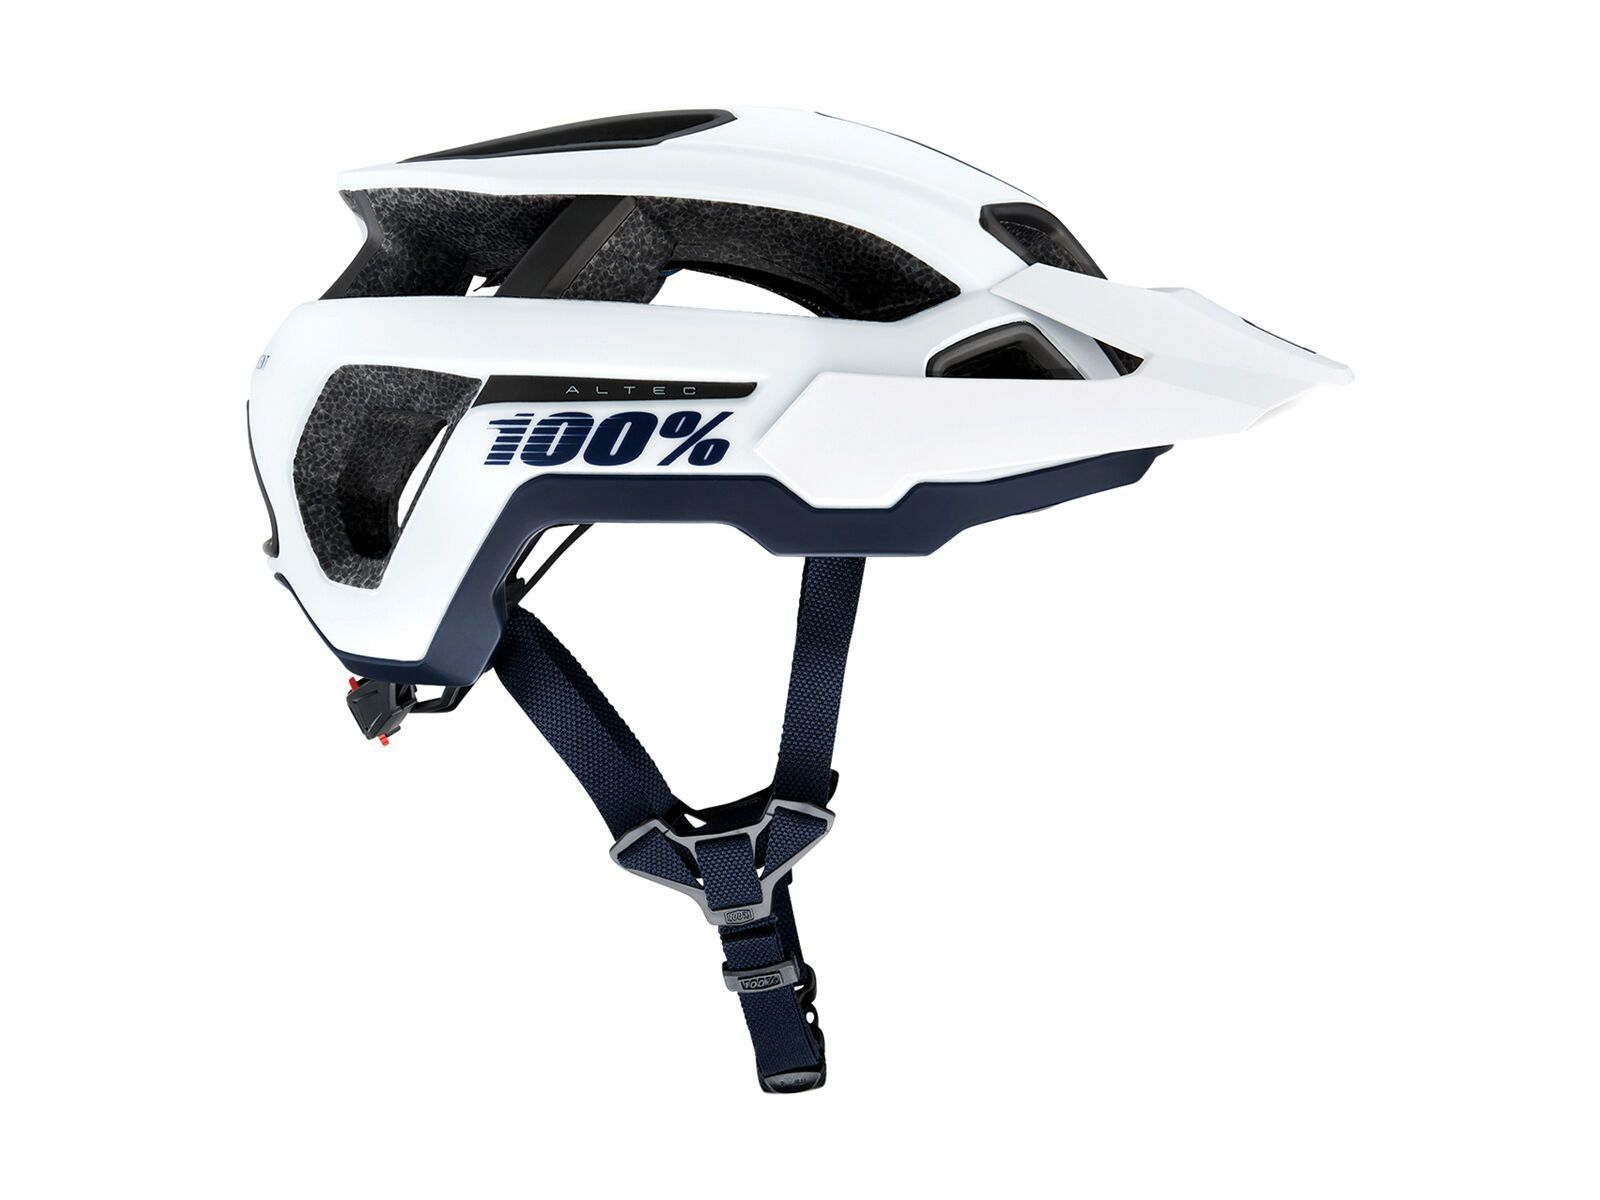 100% Altec, white - Fahrradhelm, Größe XS/S // 50-55 cm HU-HLT-0020-XS/S-2-white